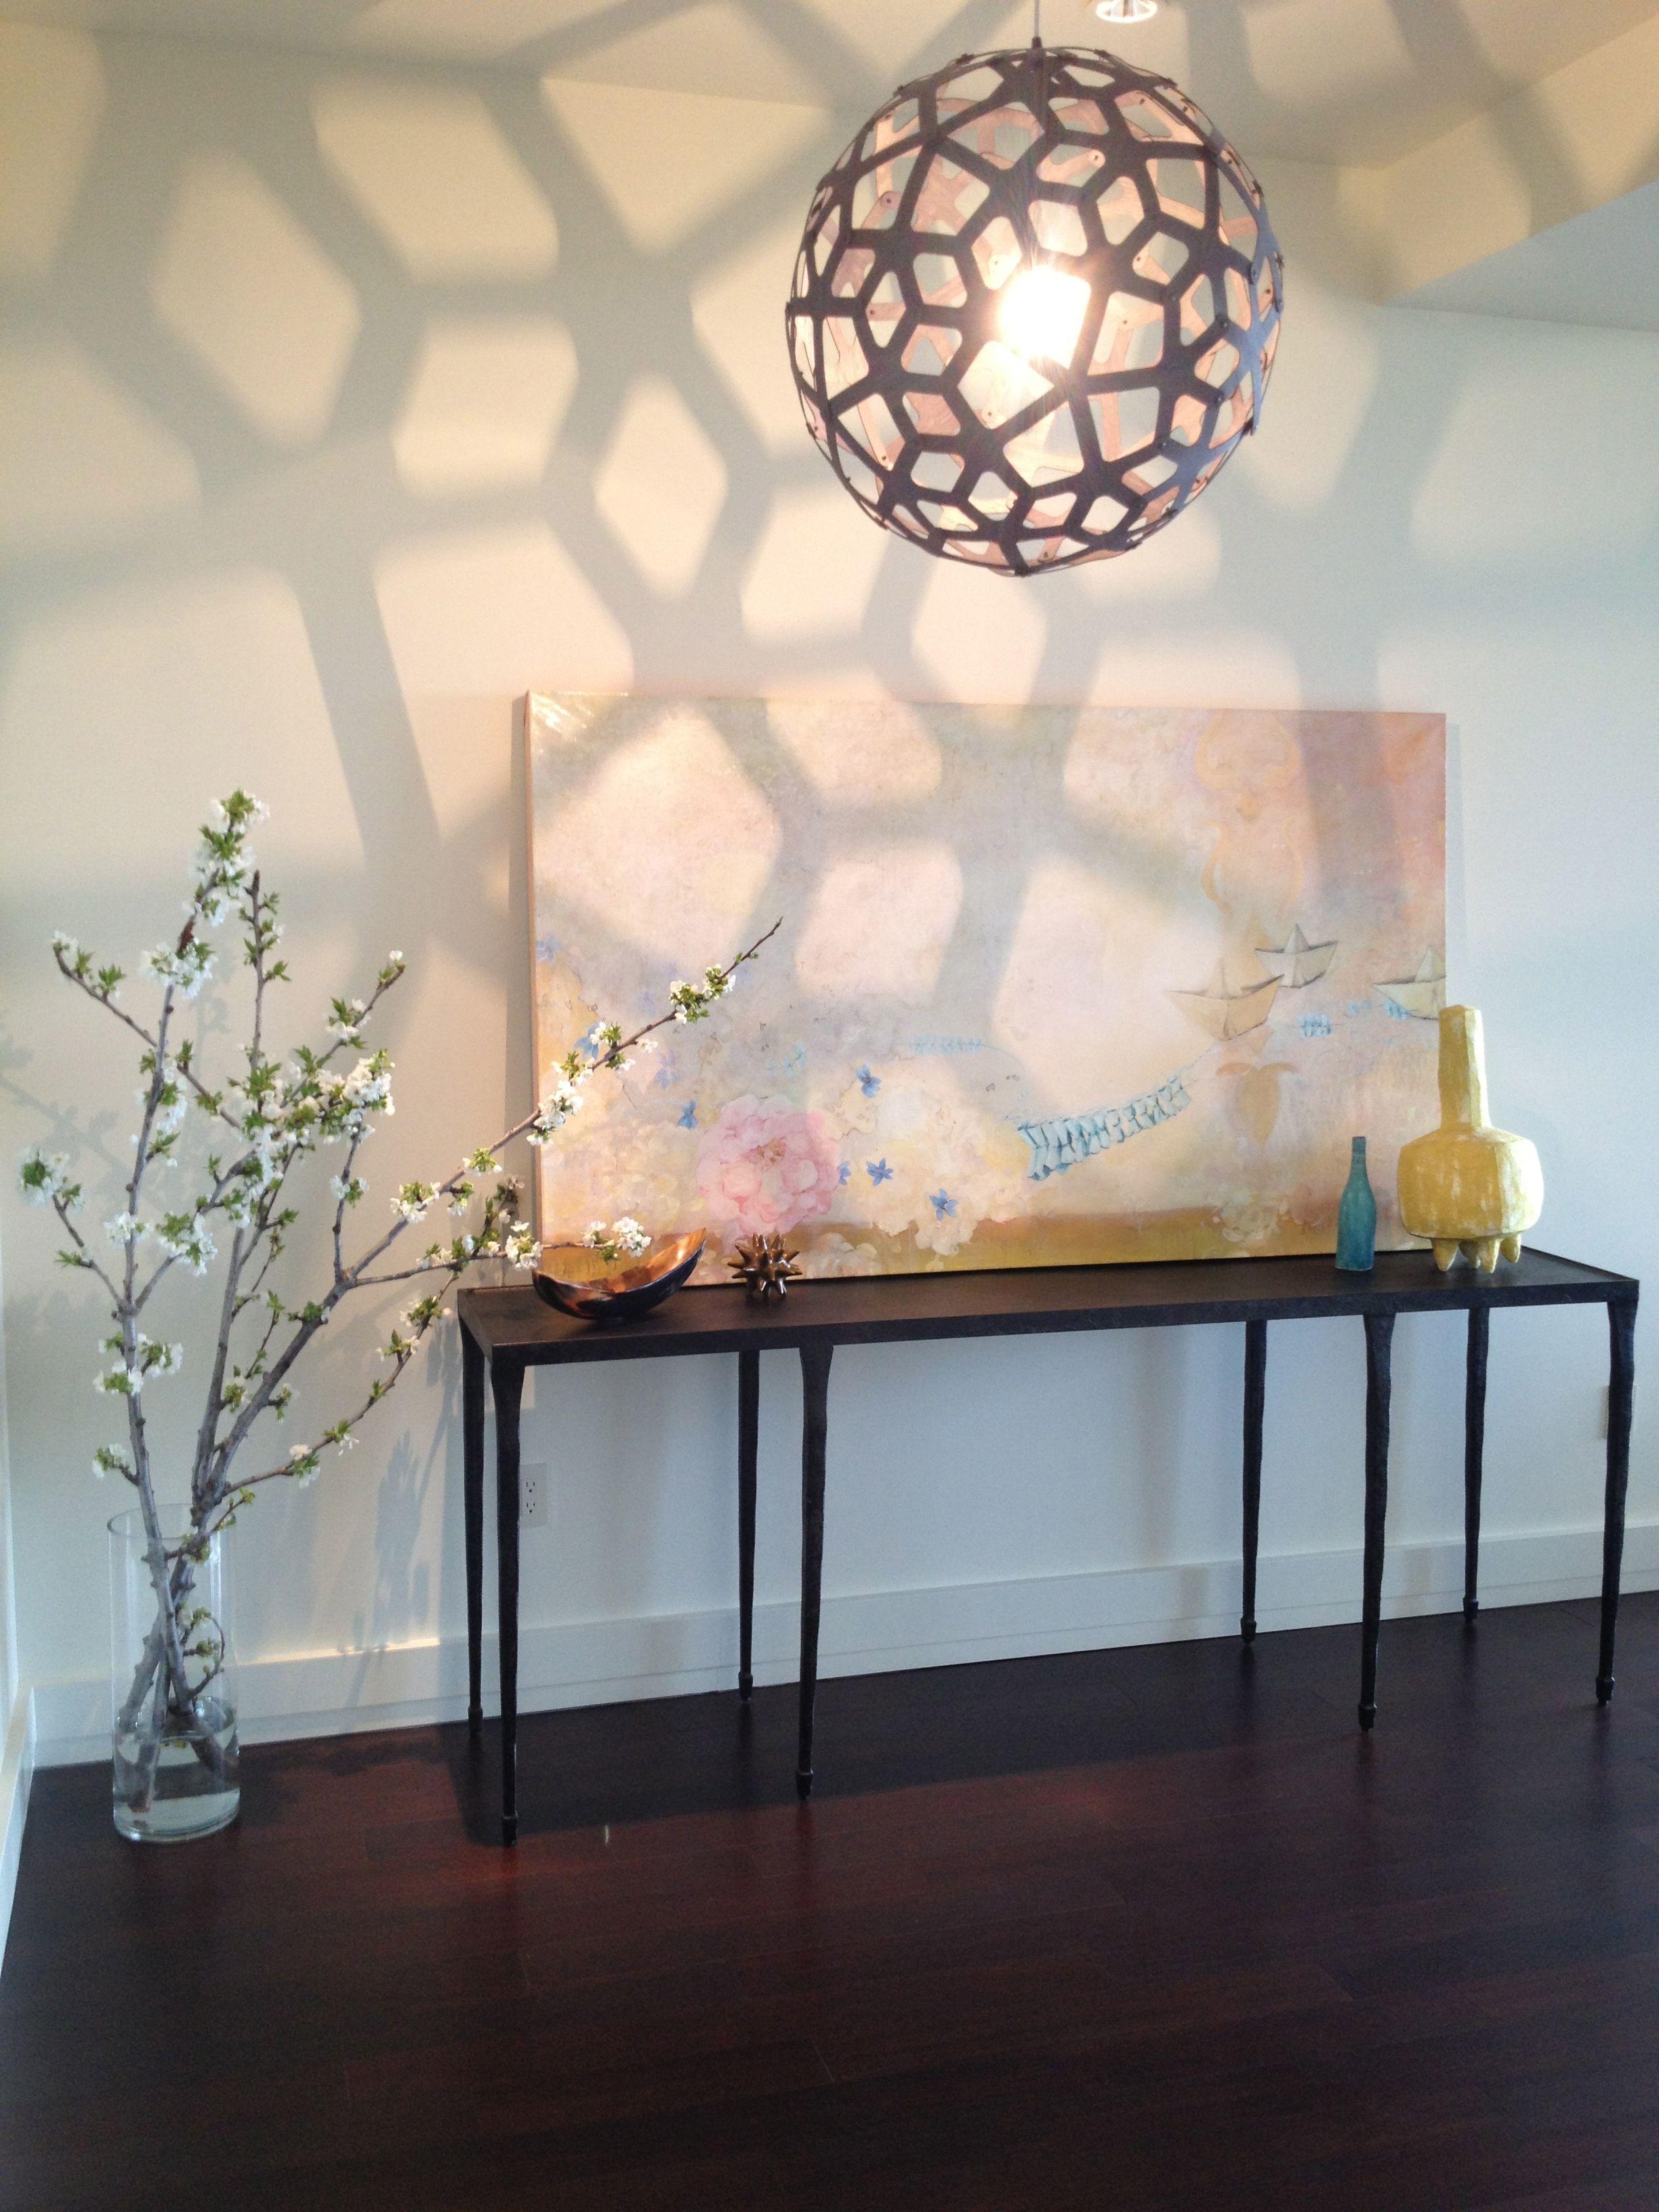 15 Entrance Hall Table Styles To Marvel At: The David Trubridge Pendants Cast Amazing Shadows & Light